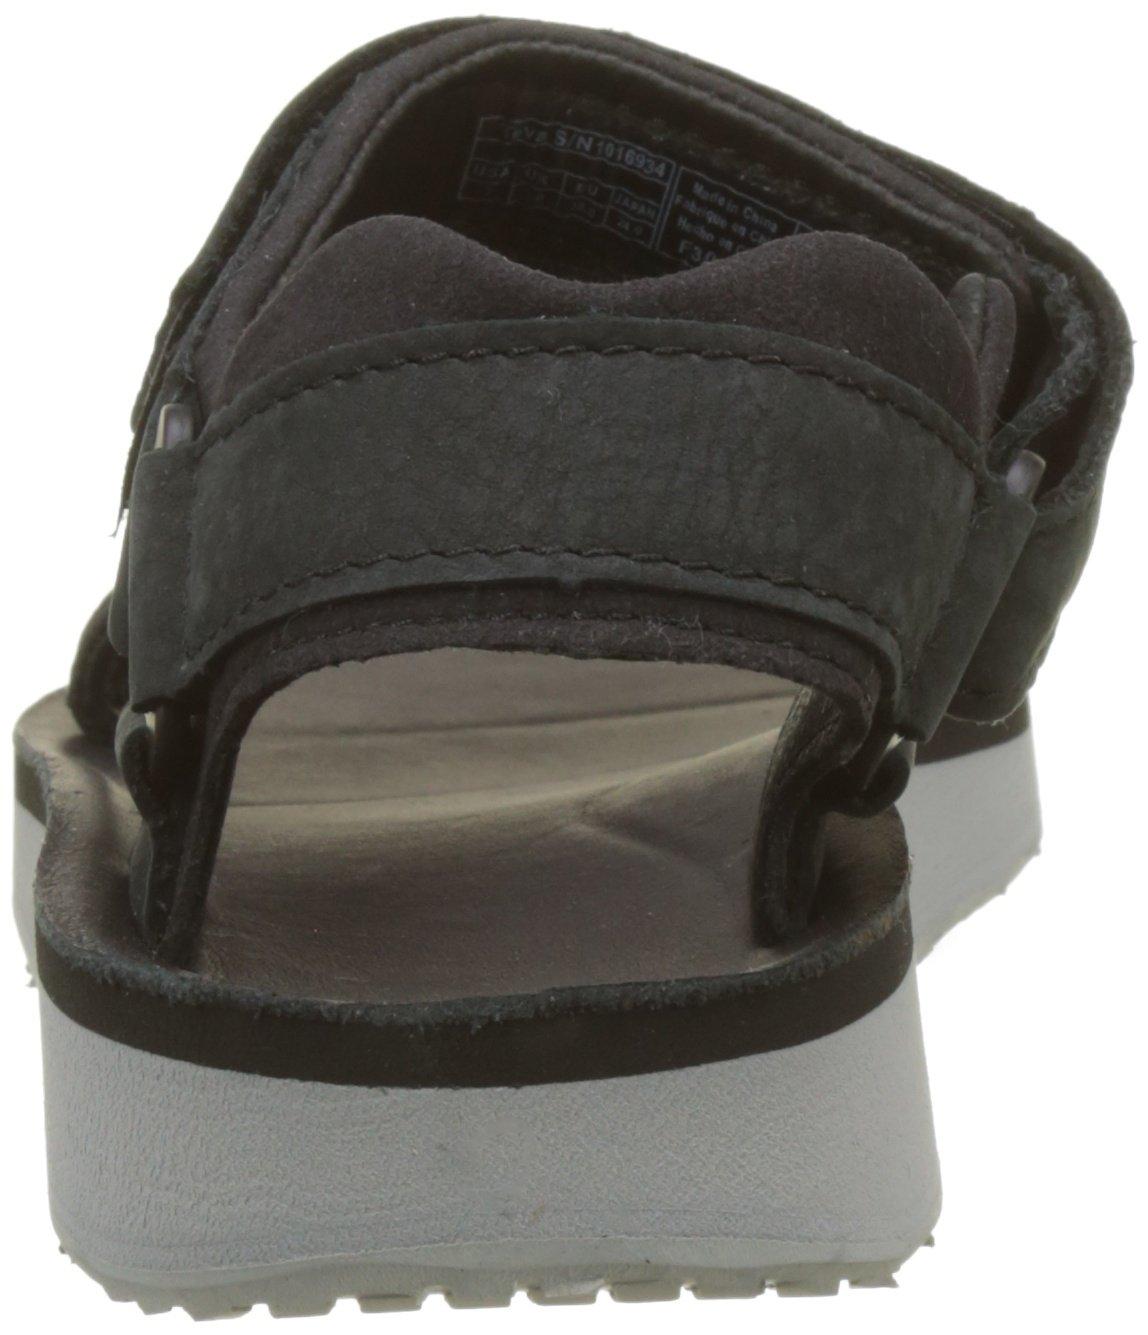 Teva Women's W Original Universal Premier-Leather Sandal B01IPRHSMM 11 B(M) US|Black